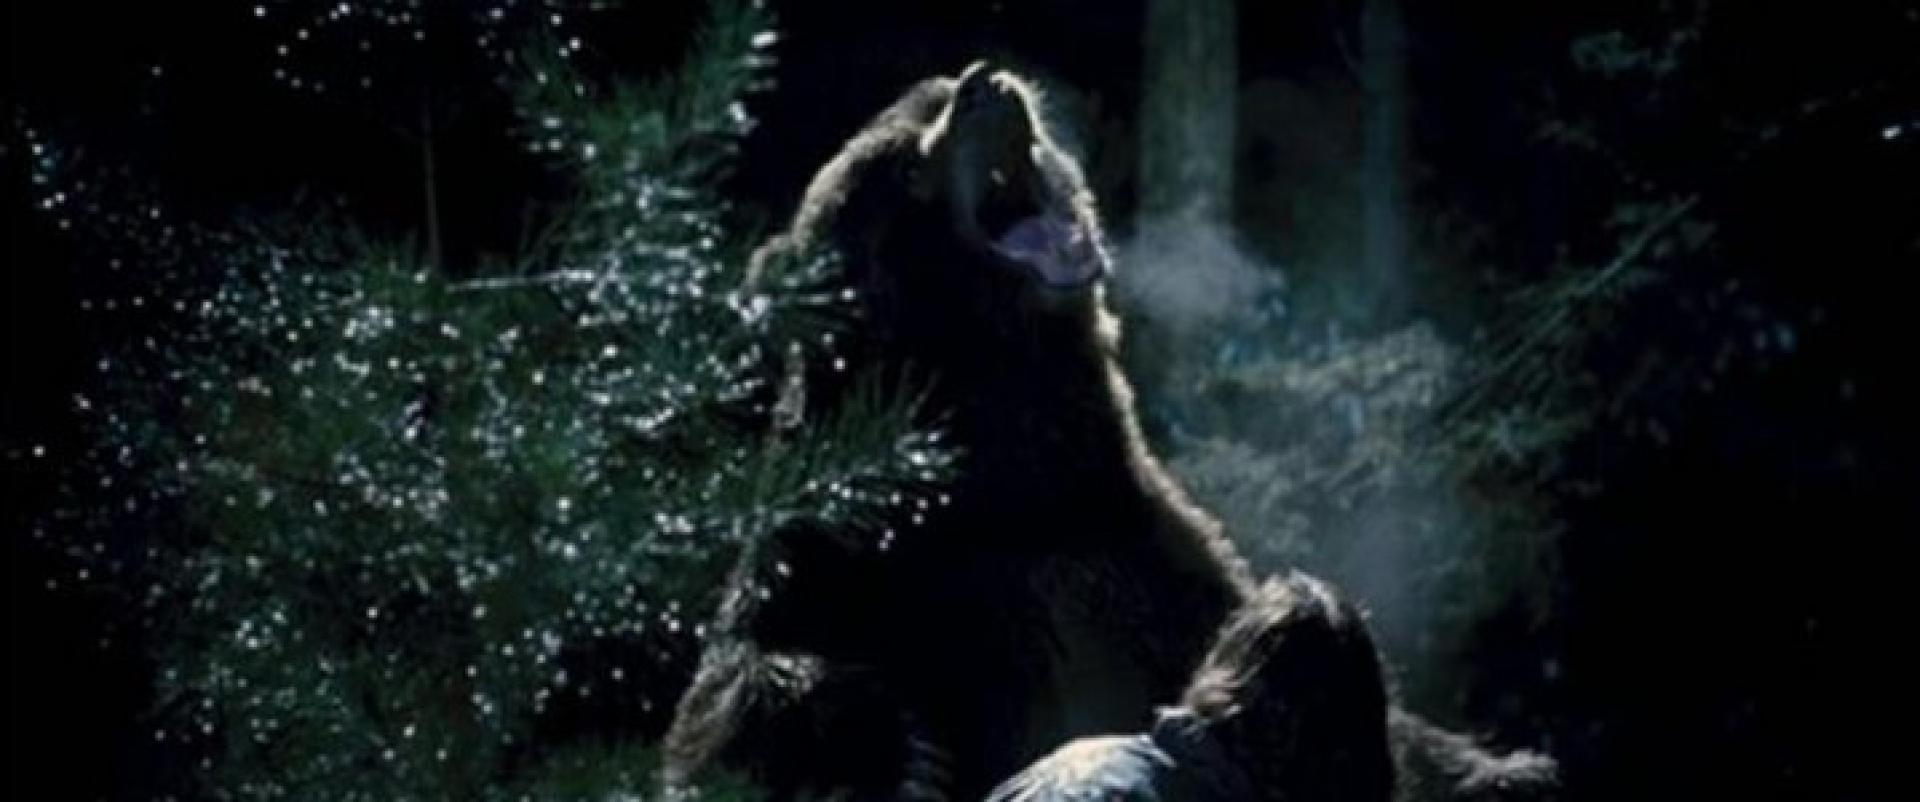 Grizzly Park - Nyolc préda (2008)